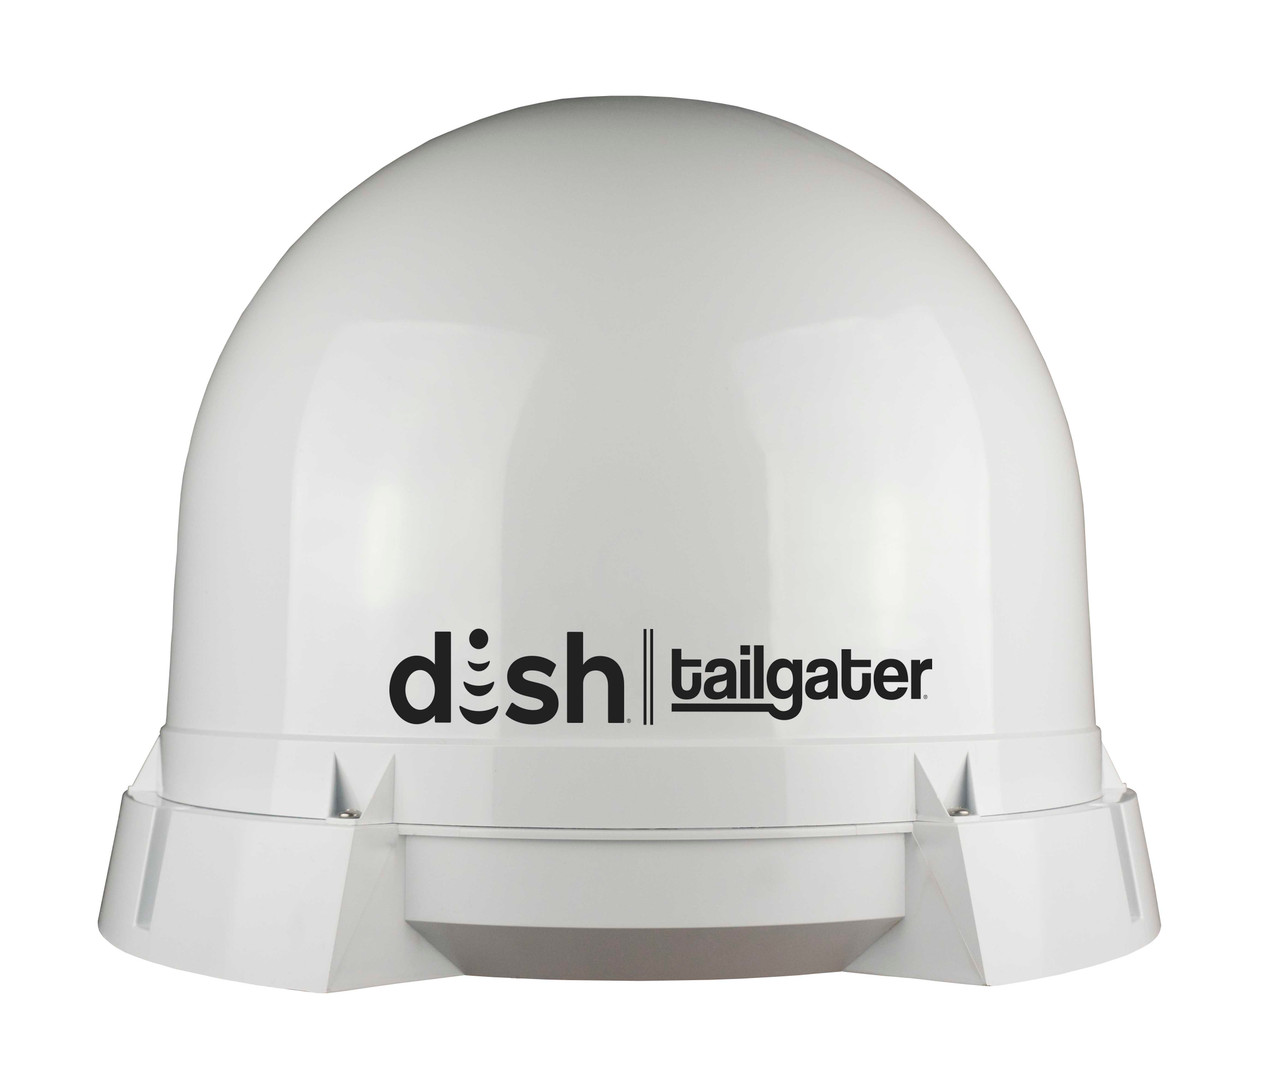 DISH Tailgater® Single Port Dome Cover